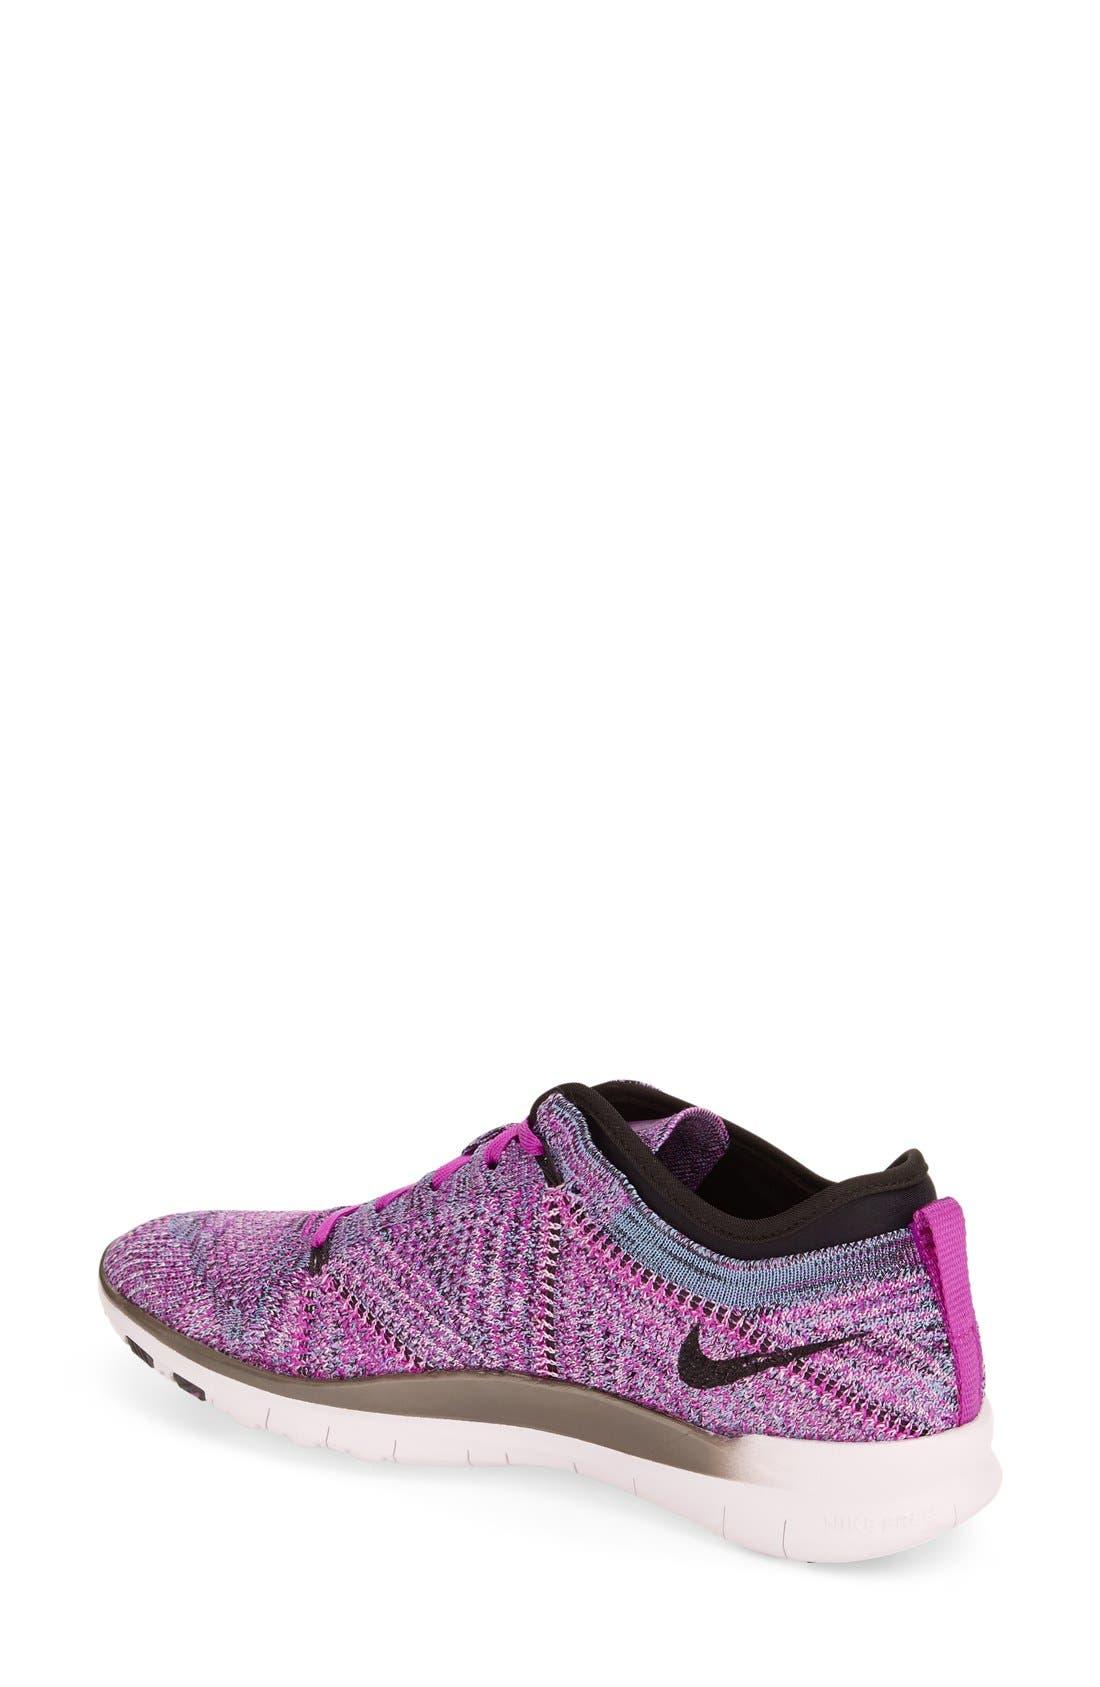 ,                             'Free Flyknit 5.0 TR' Training Shoe,                             Alternate thumbnail 46, color,                             599